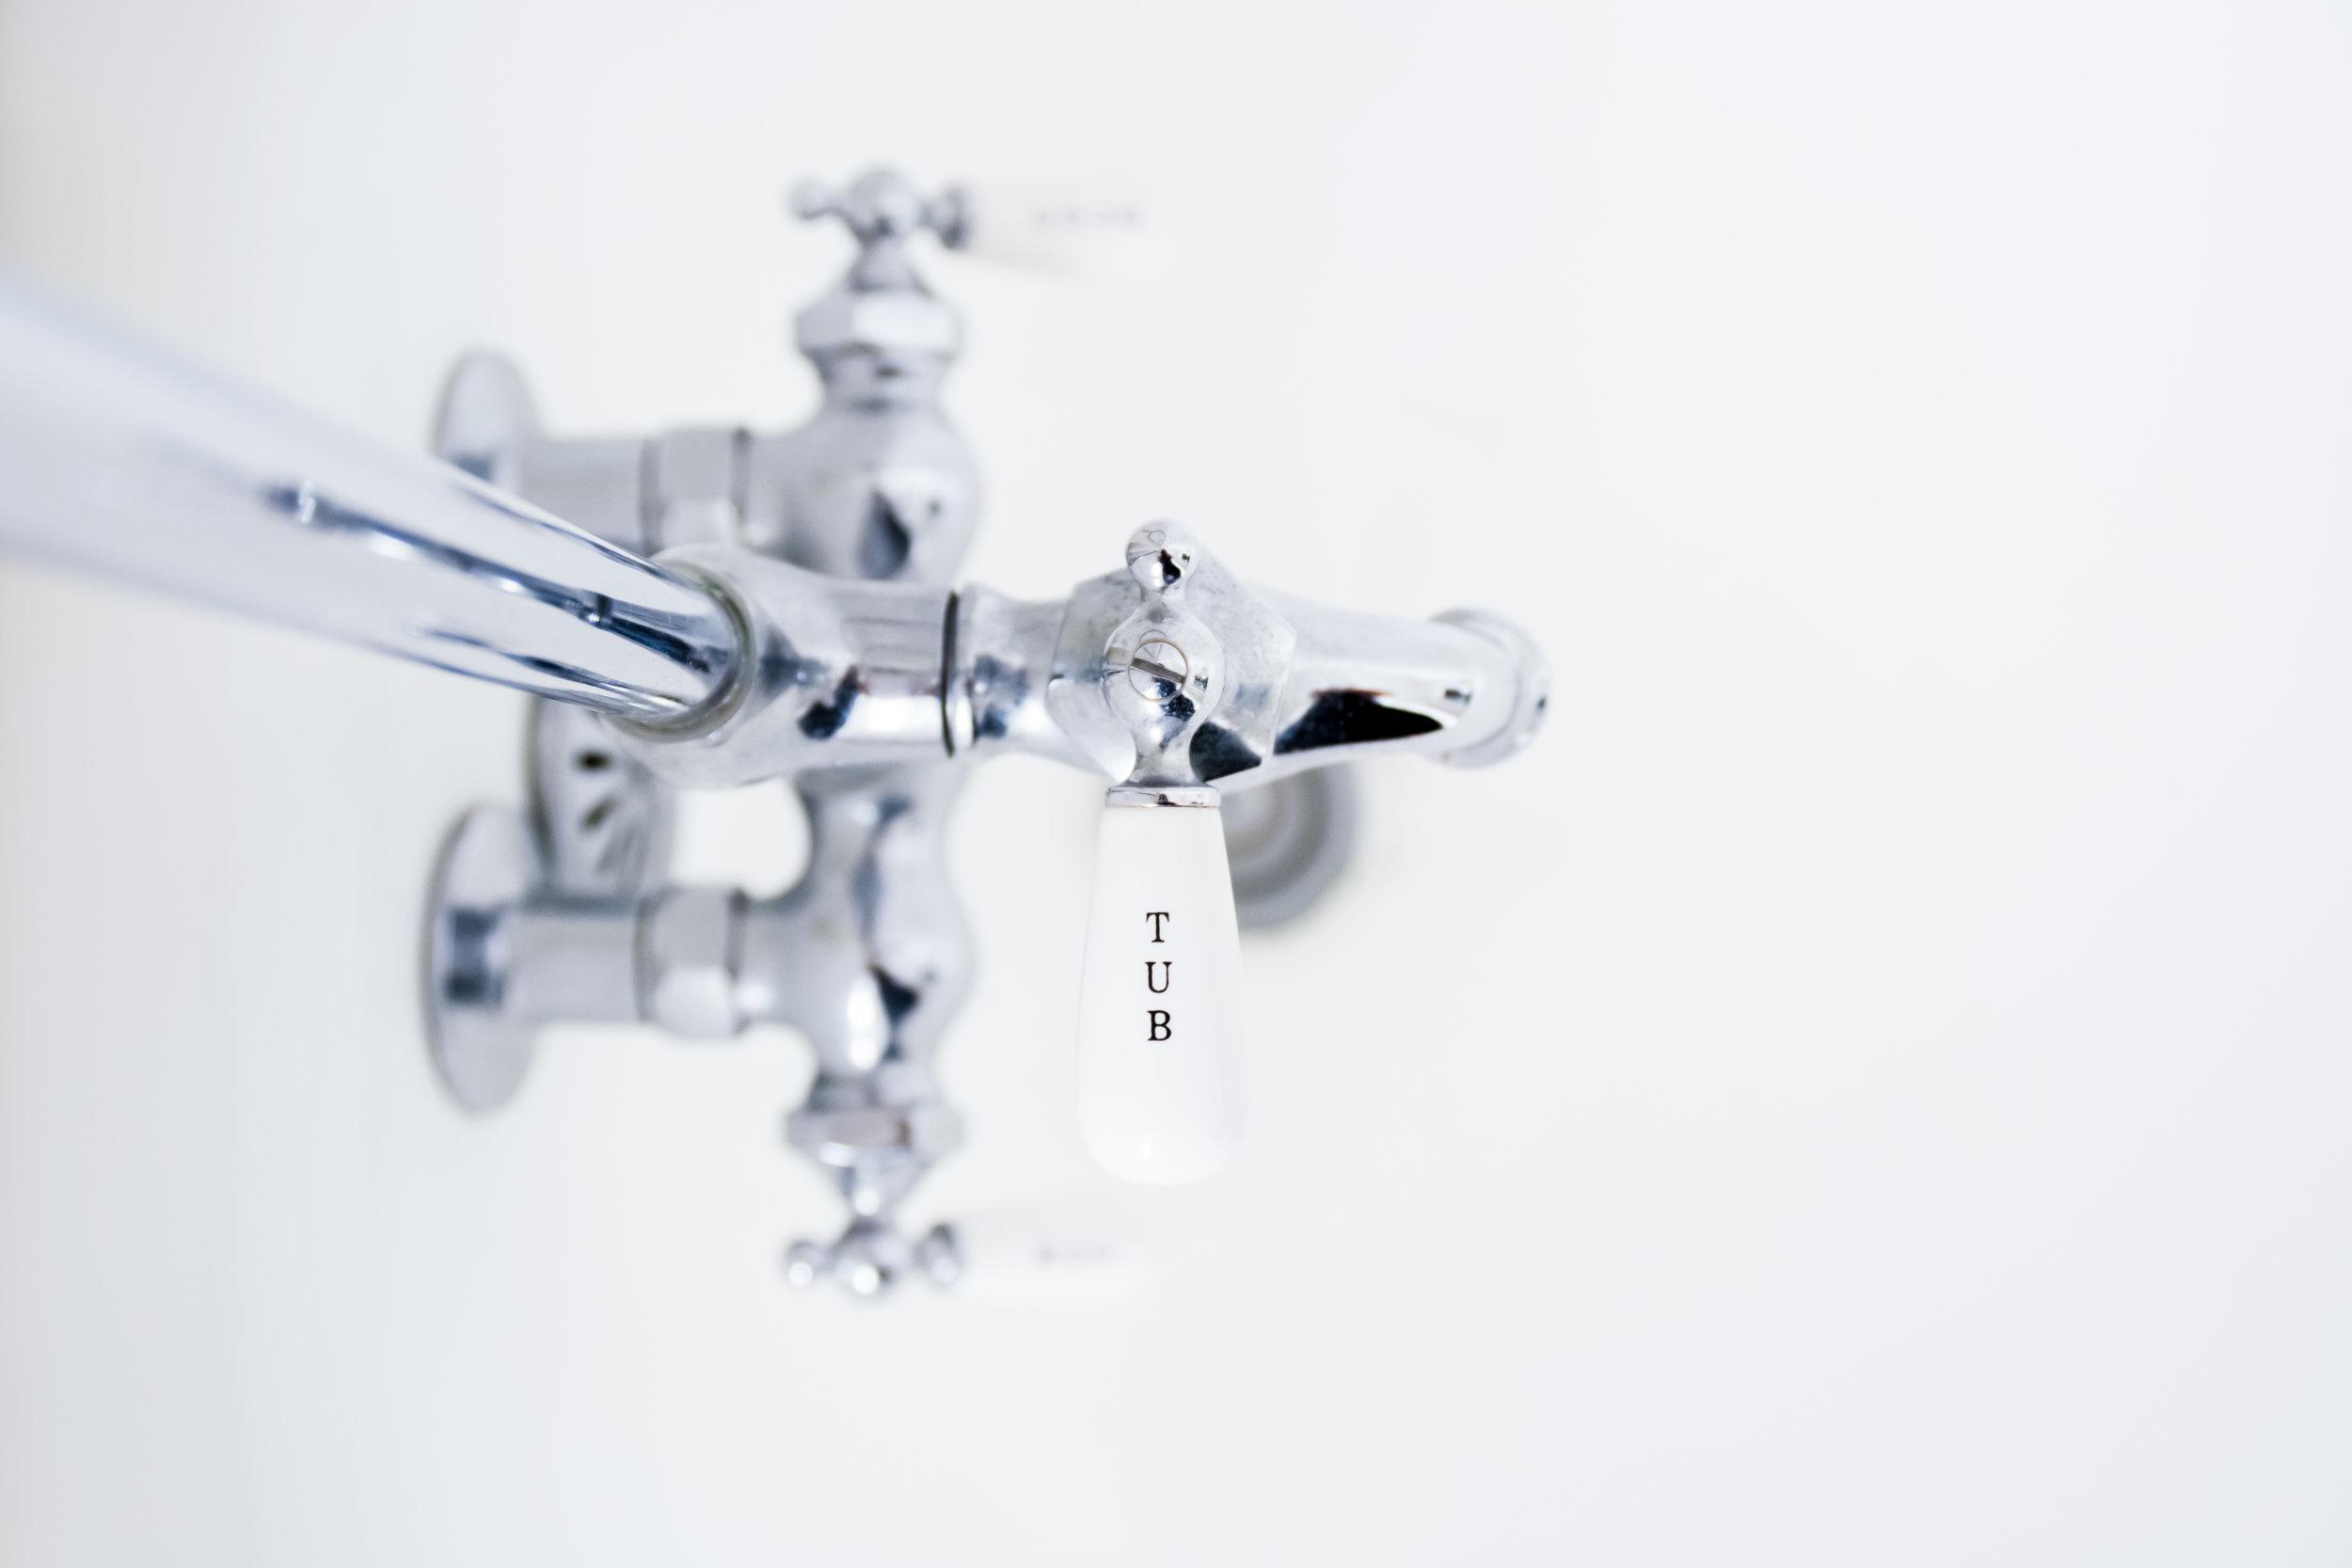 abigail-lynn-517203-unsplash.jpg